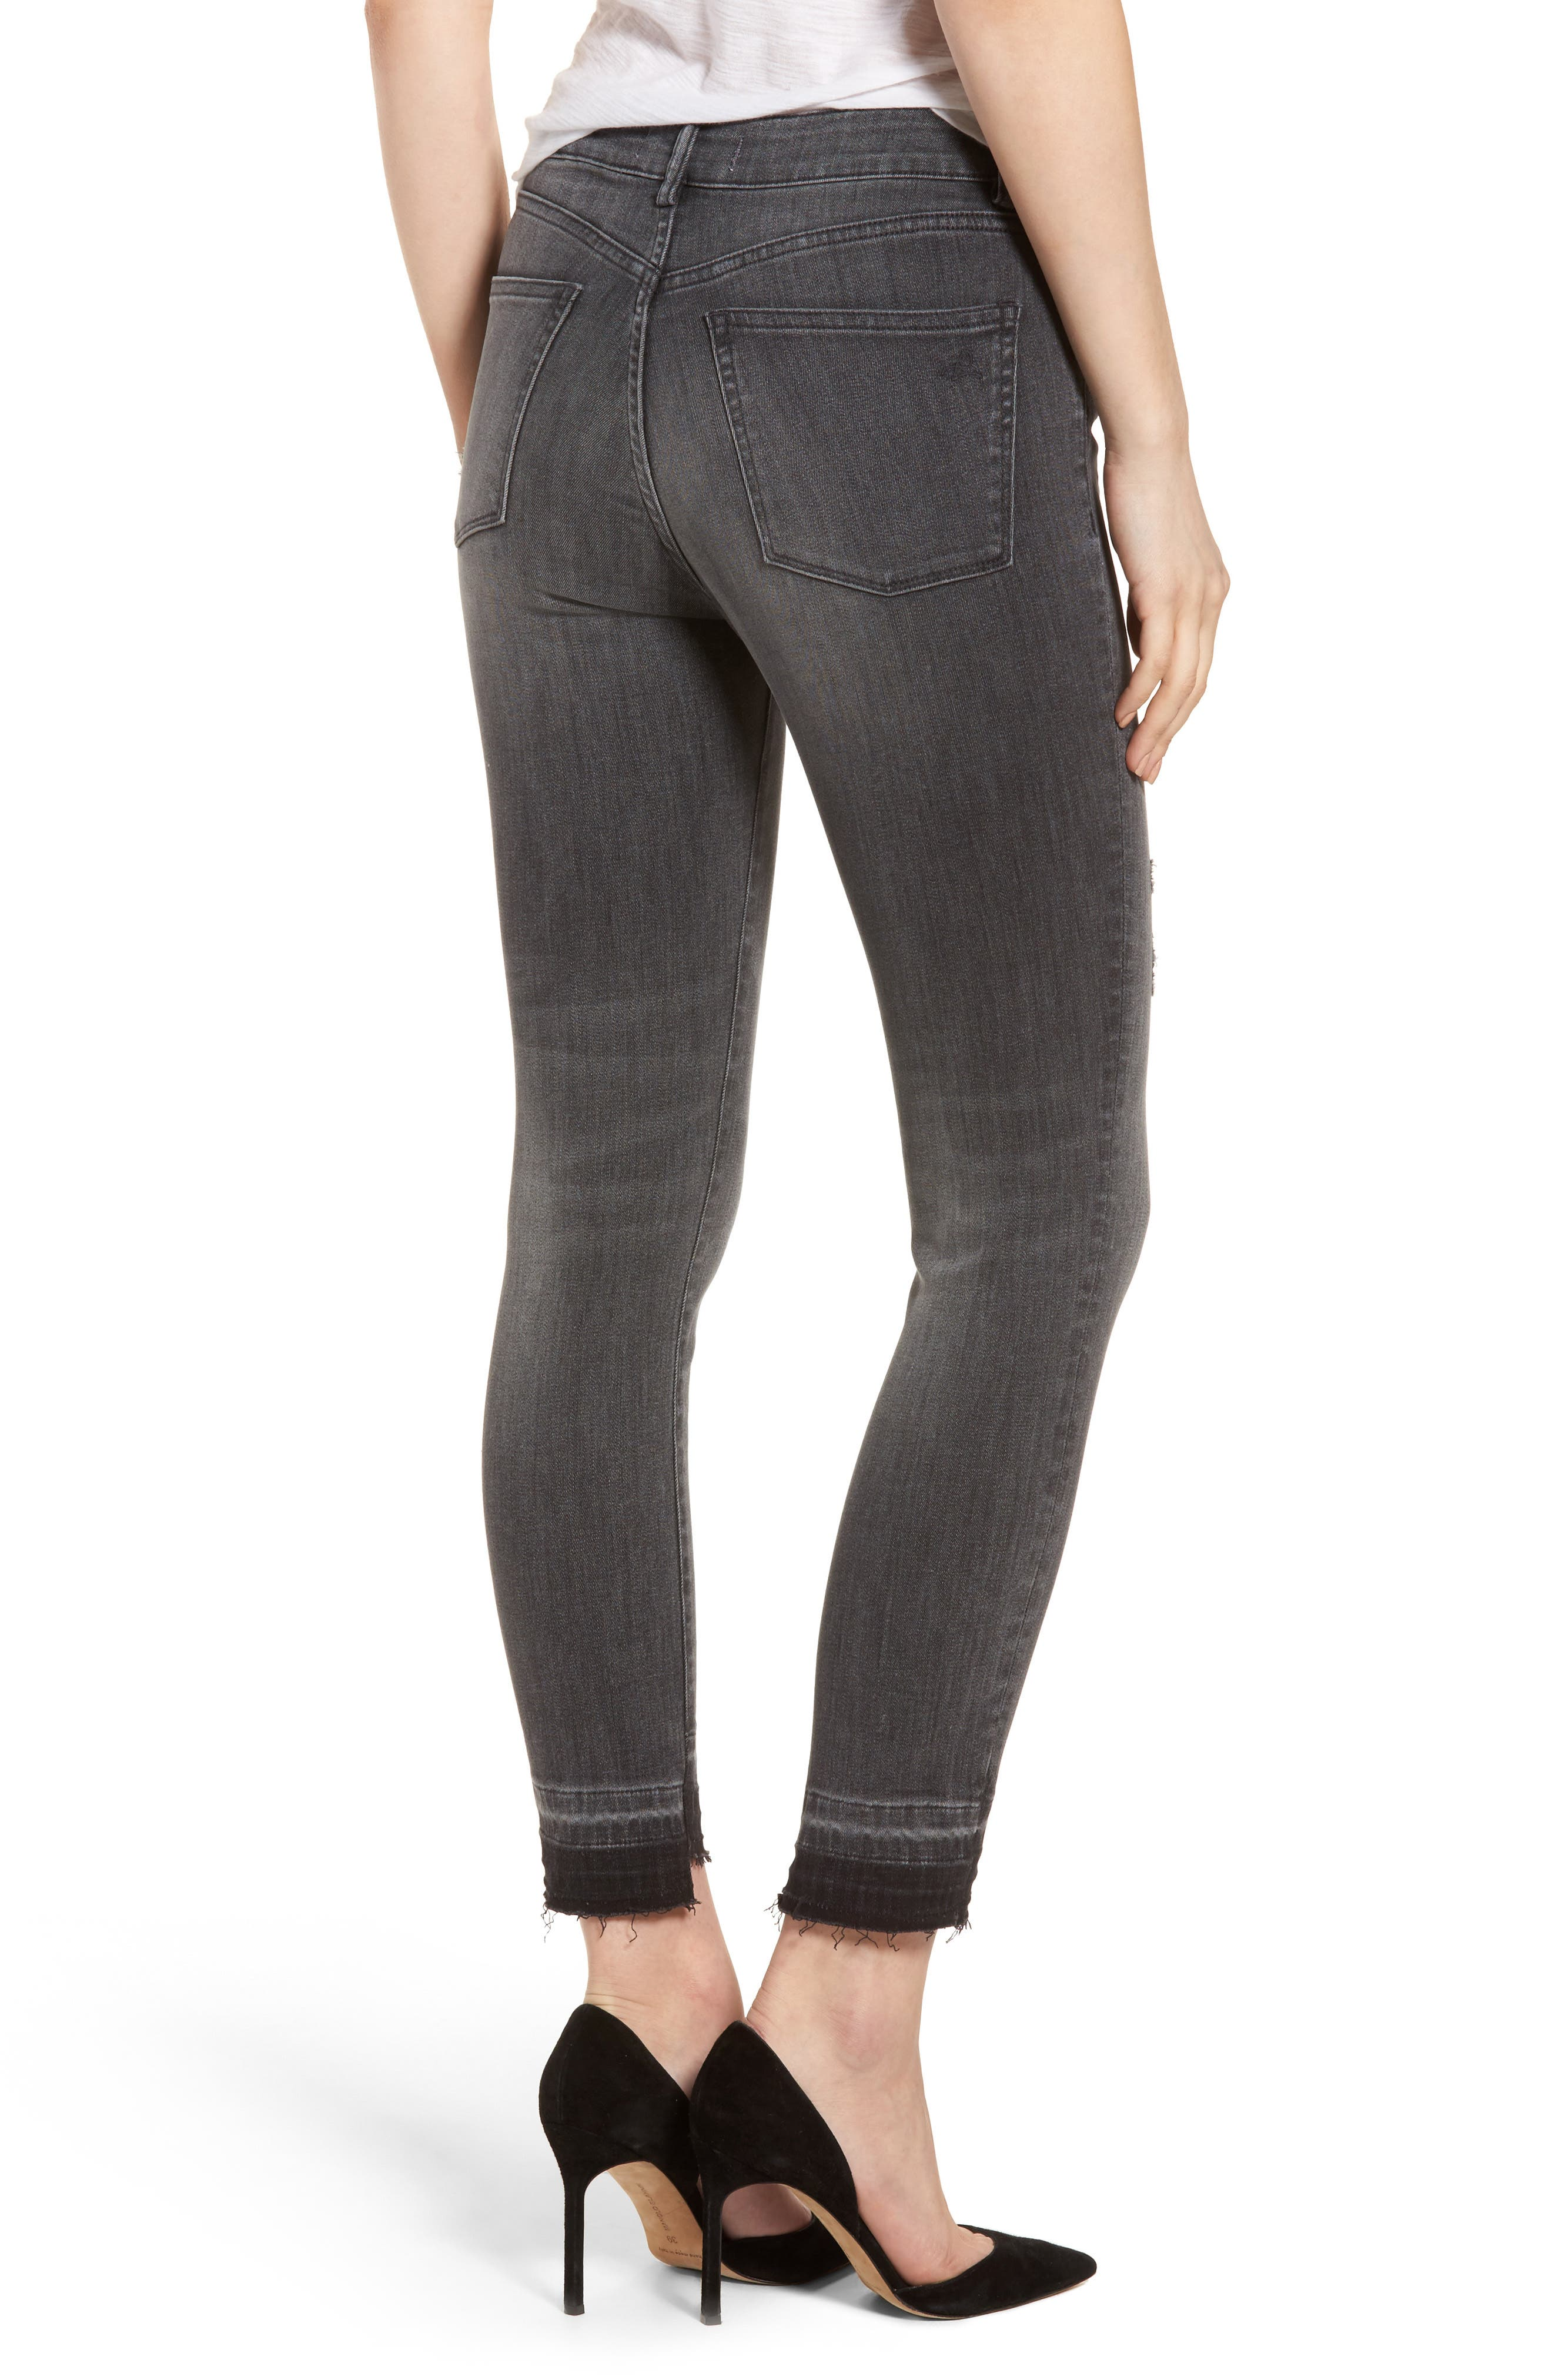 Farrow High Waist Instaslim Skinny Jeans,                             Alternate thumbnail 2, color,                             020